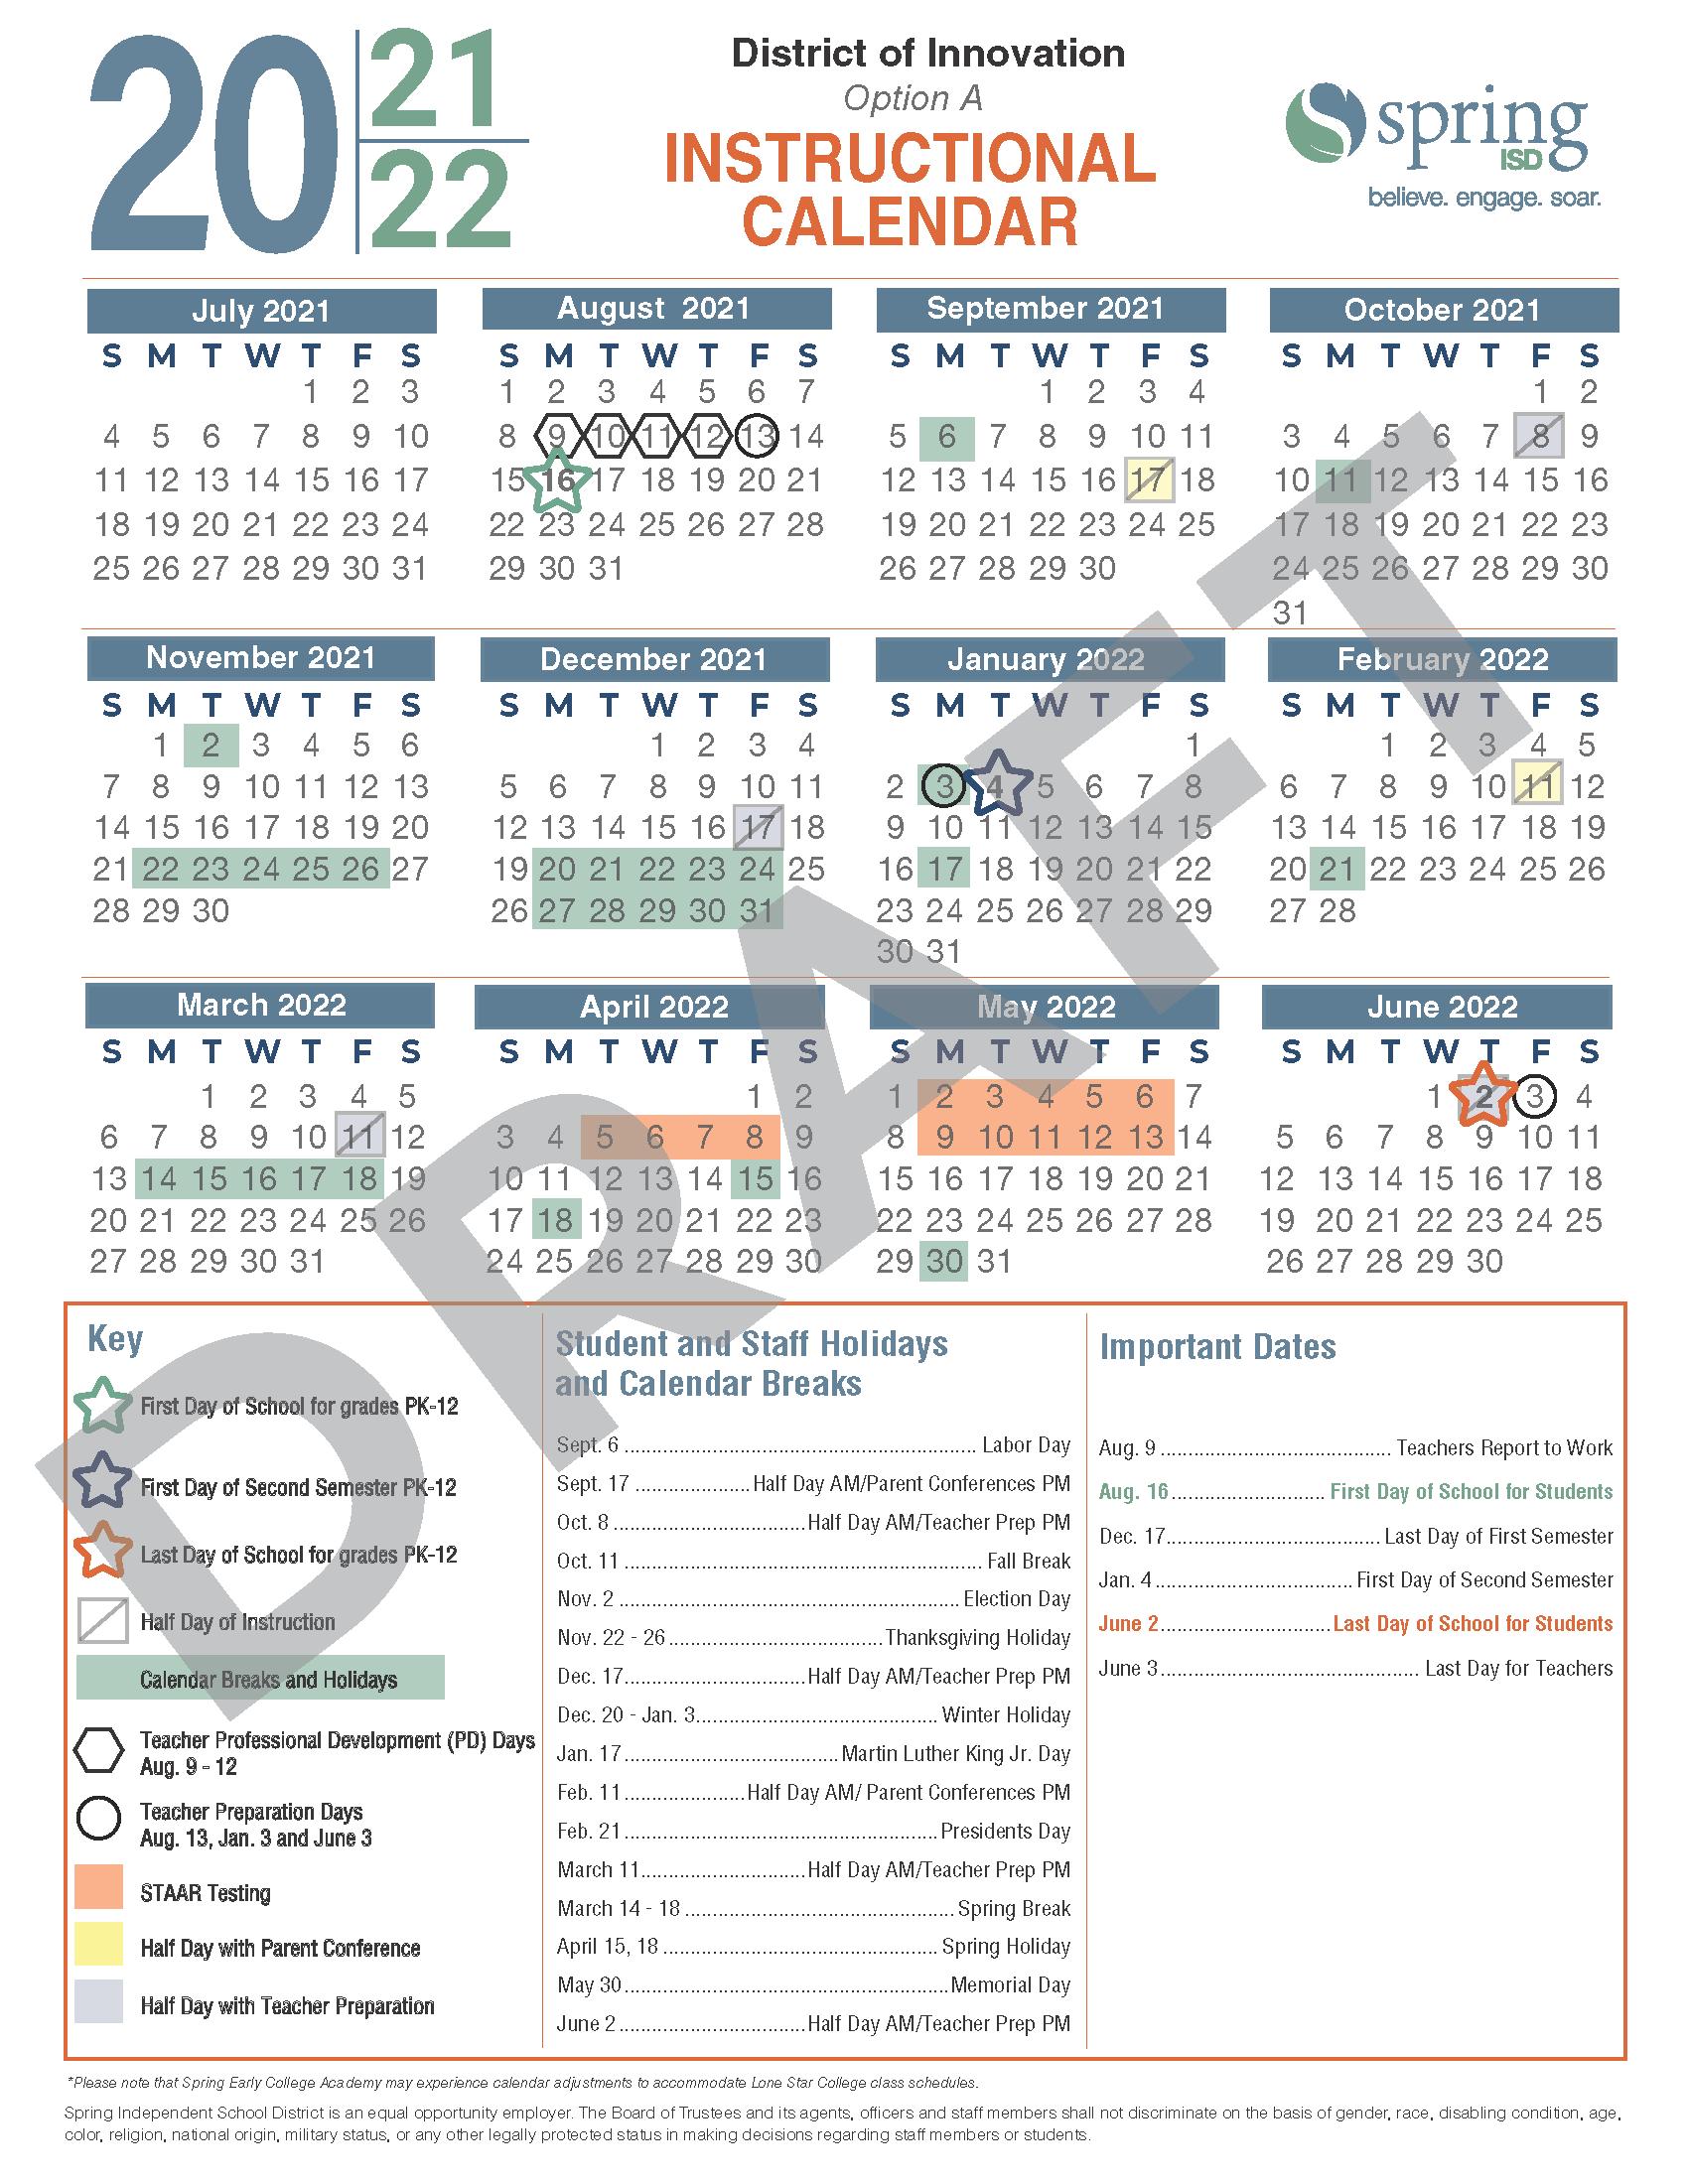 Calendar Survey / 2021 22 Instructional Calendar Survey / Encuesta